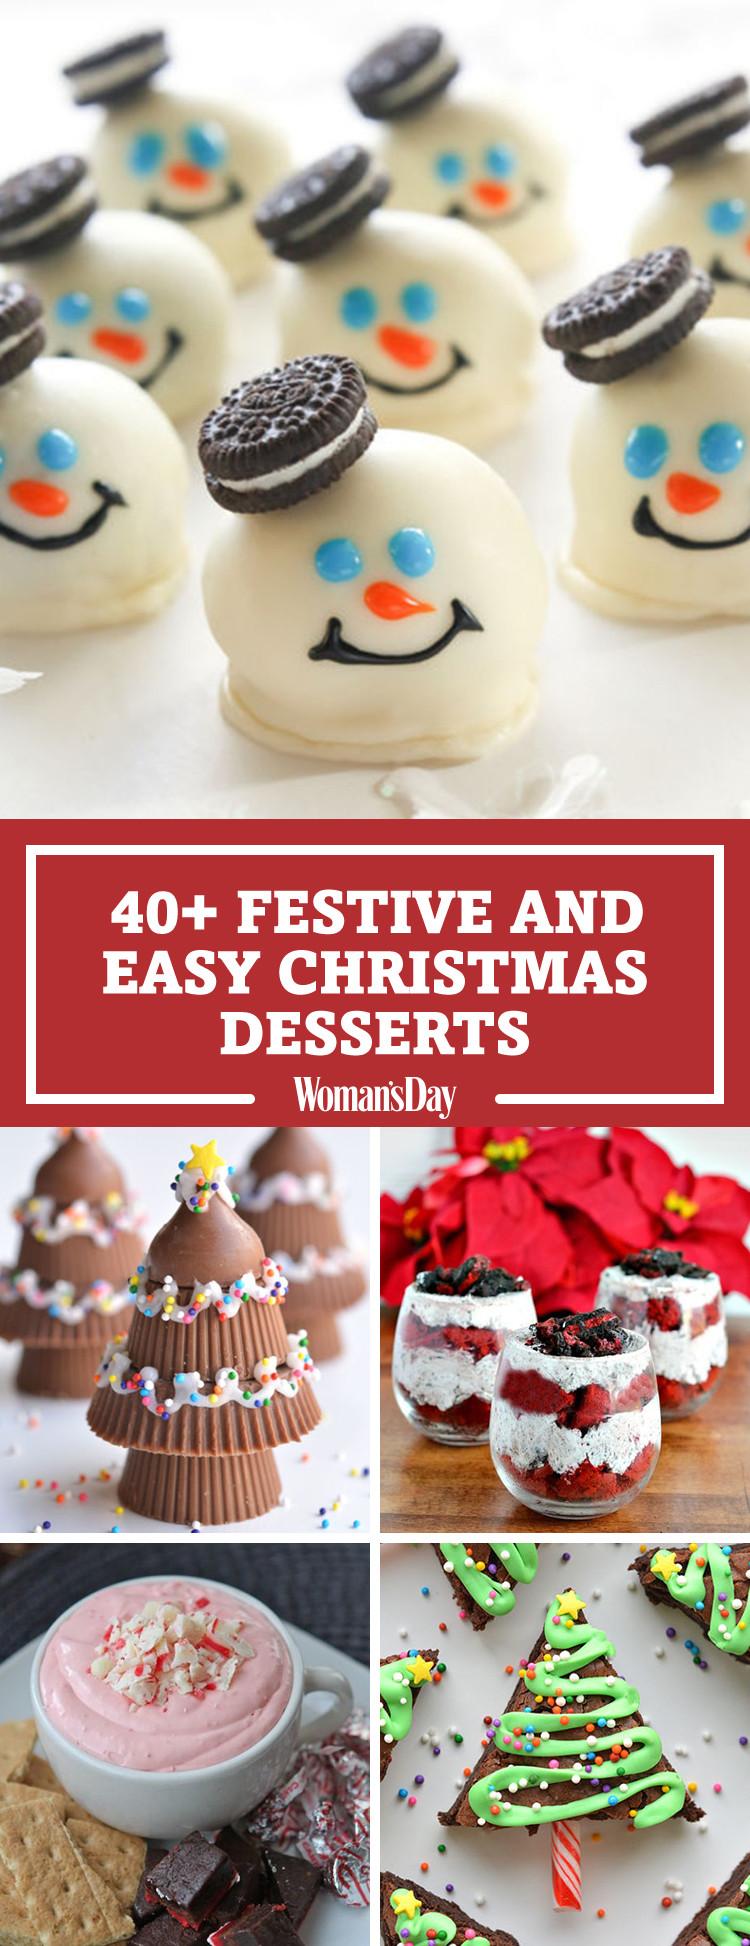 Easy To Make Christmas Desserts  57 Easy Christmas Dessert Recipes Best Ideas for Fun